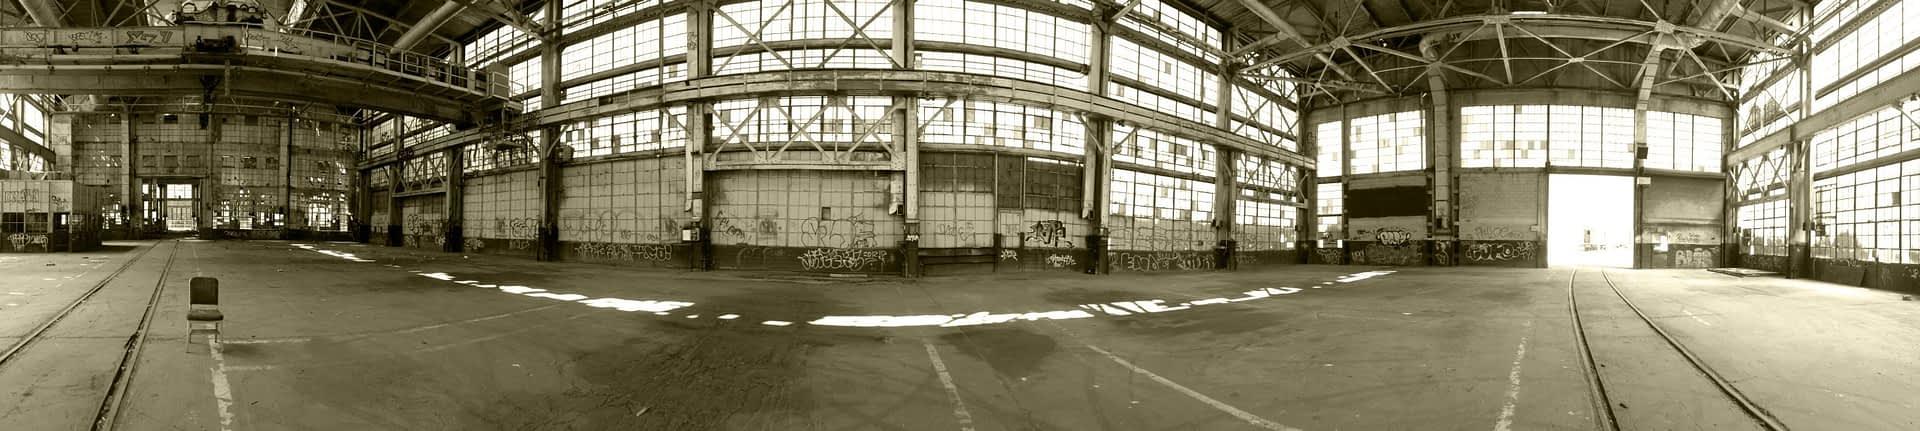 Rail Yards – Sepia Pano